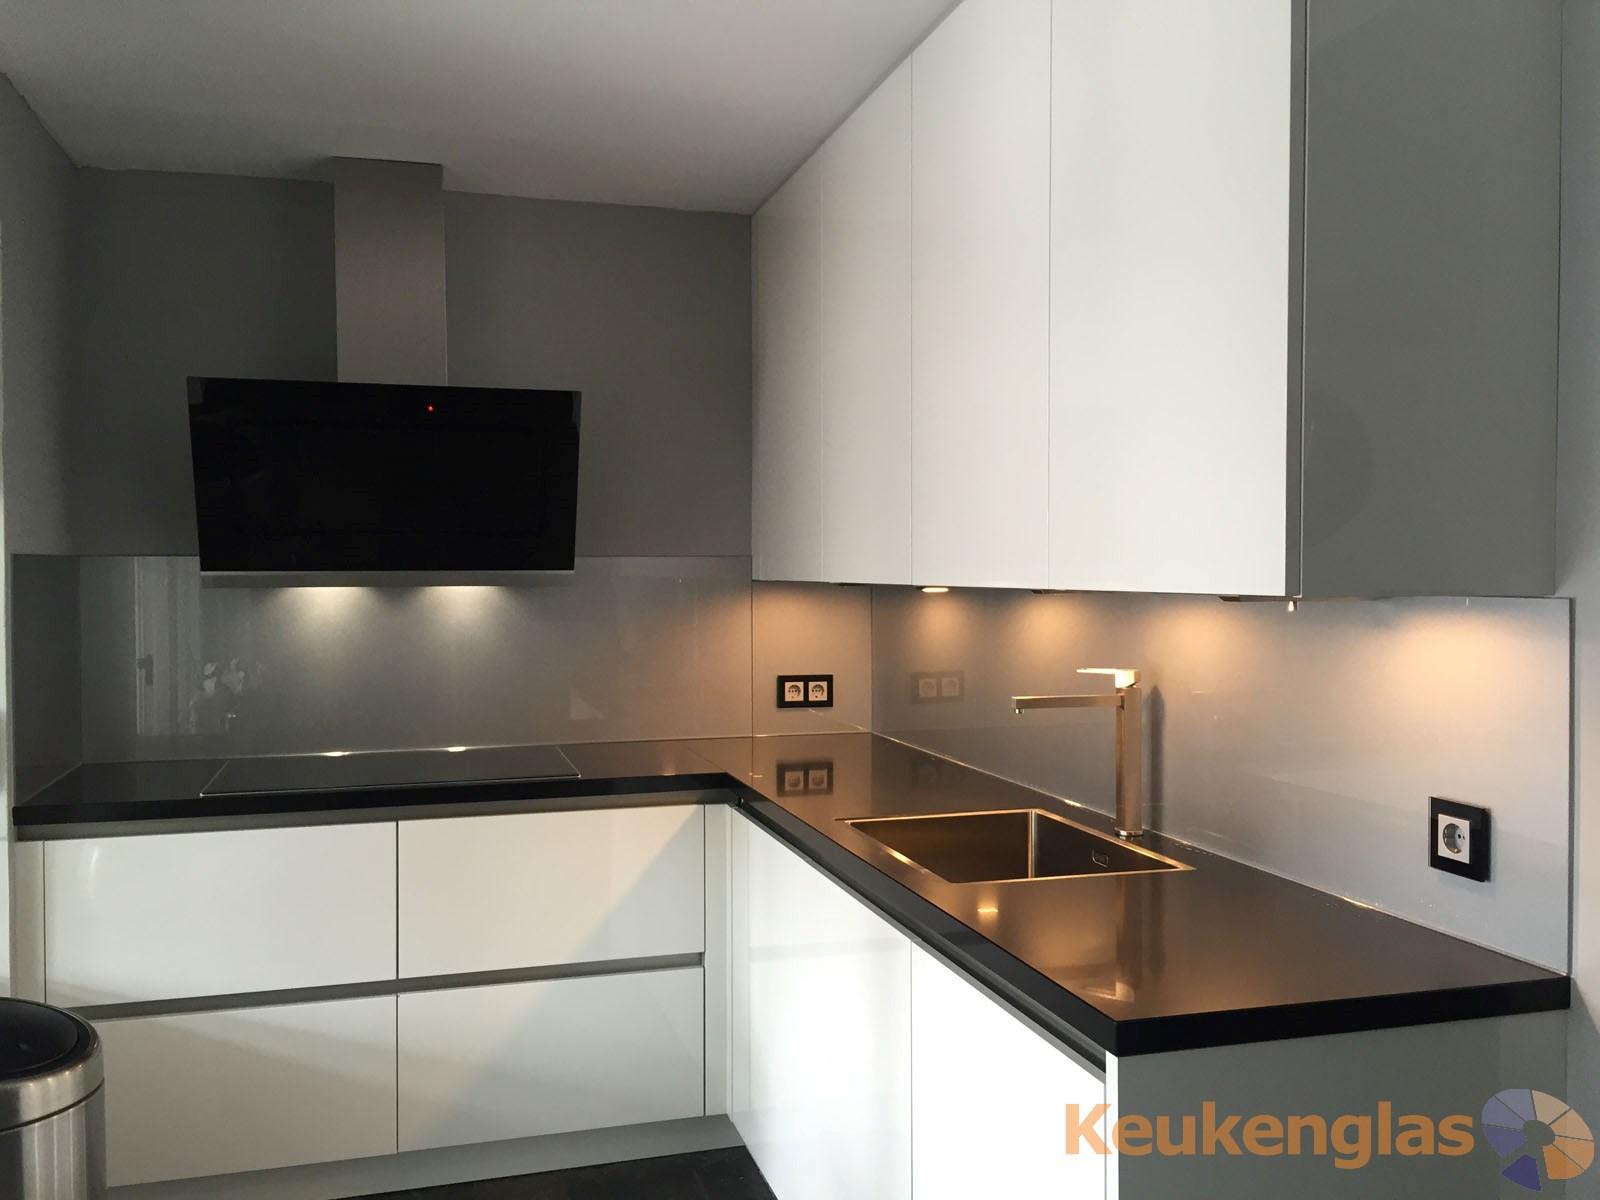 Keuken Achterwand Goedkoop : Achterwand keuken glas goedkoop glazen keuken achterwanden